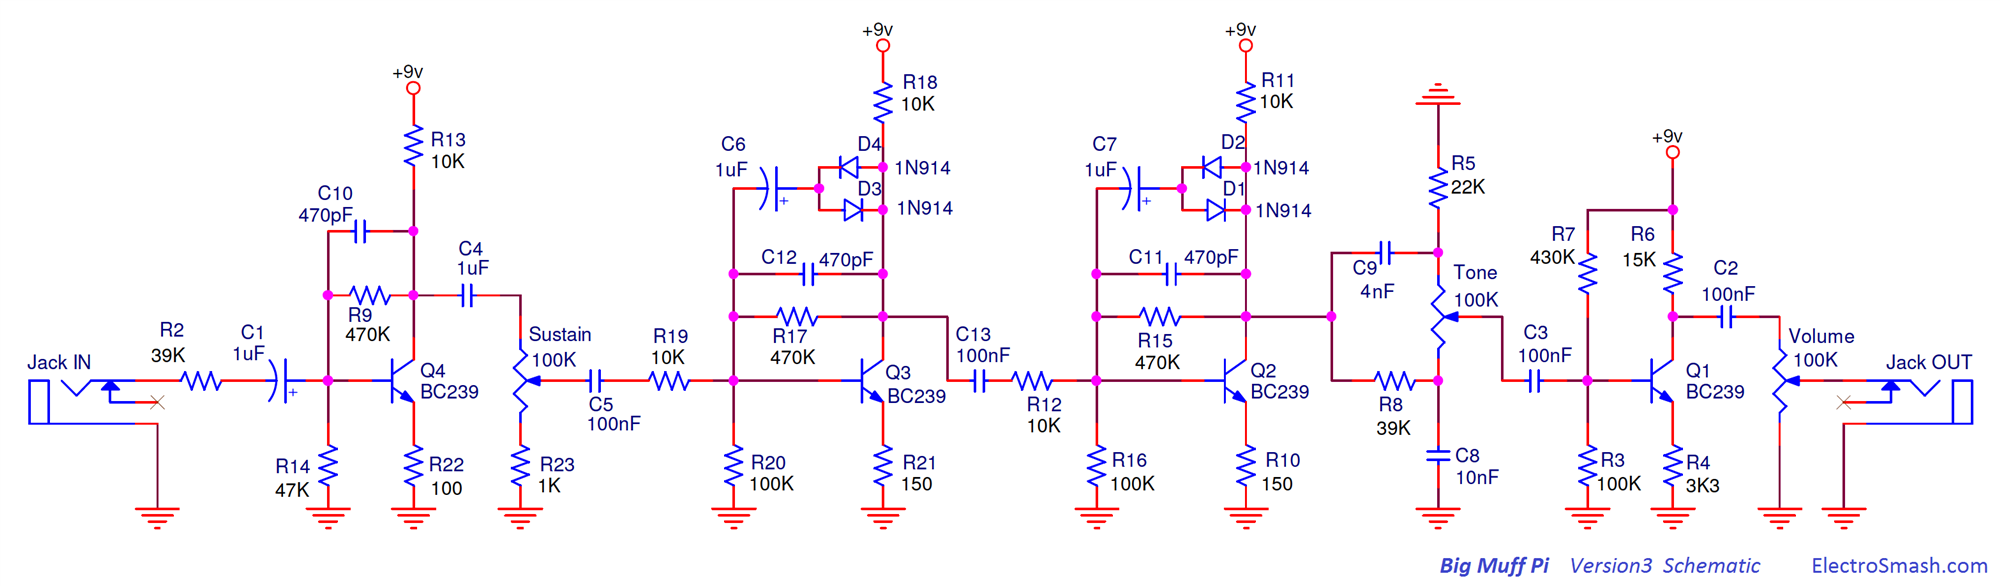 Electrosmash Selected Schematics Bass Amp Wiring Diagram Big Muff Pi Version 3